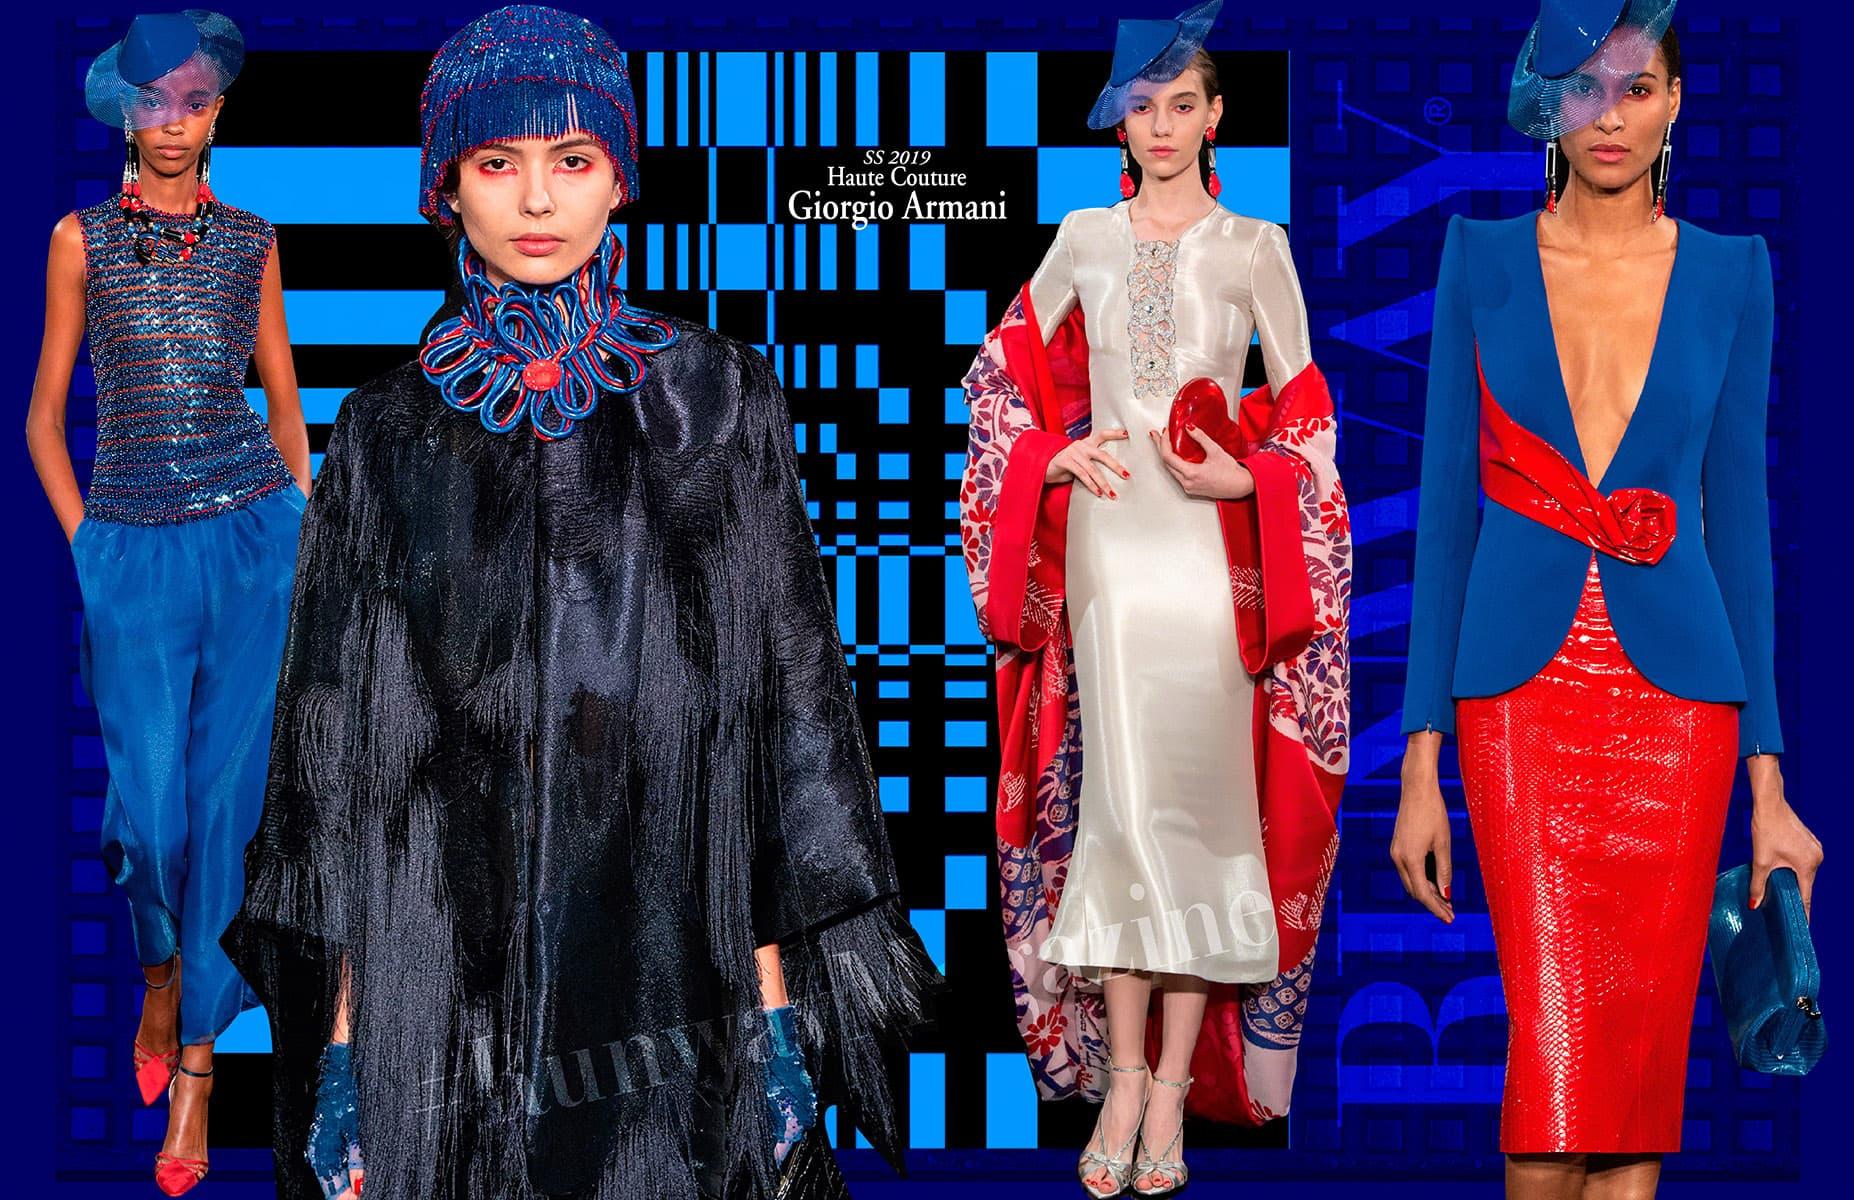 Giorgio Armani Haute Couture Spring Summer 2019 by RUNWAY MAGAZINE